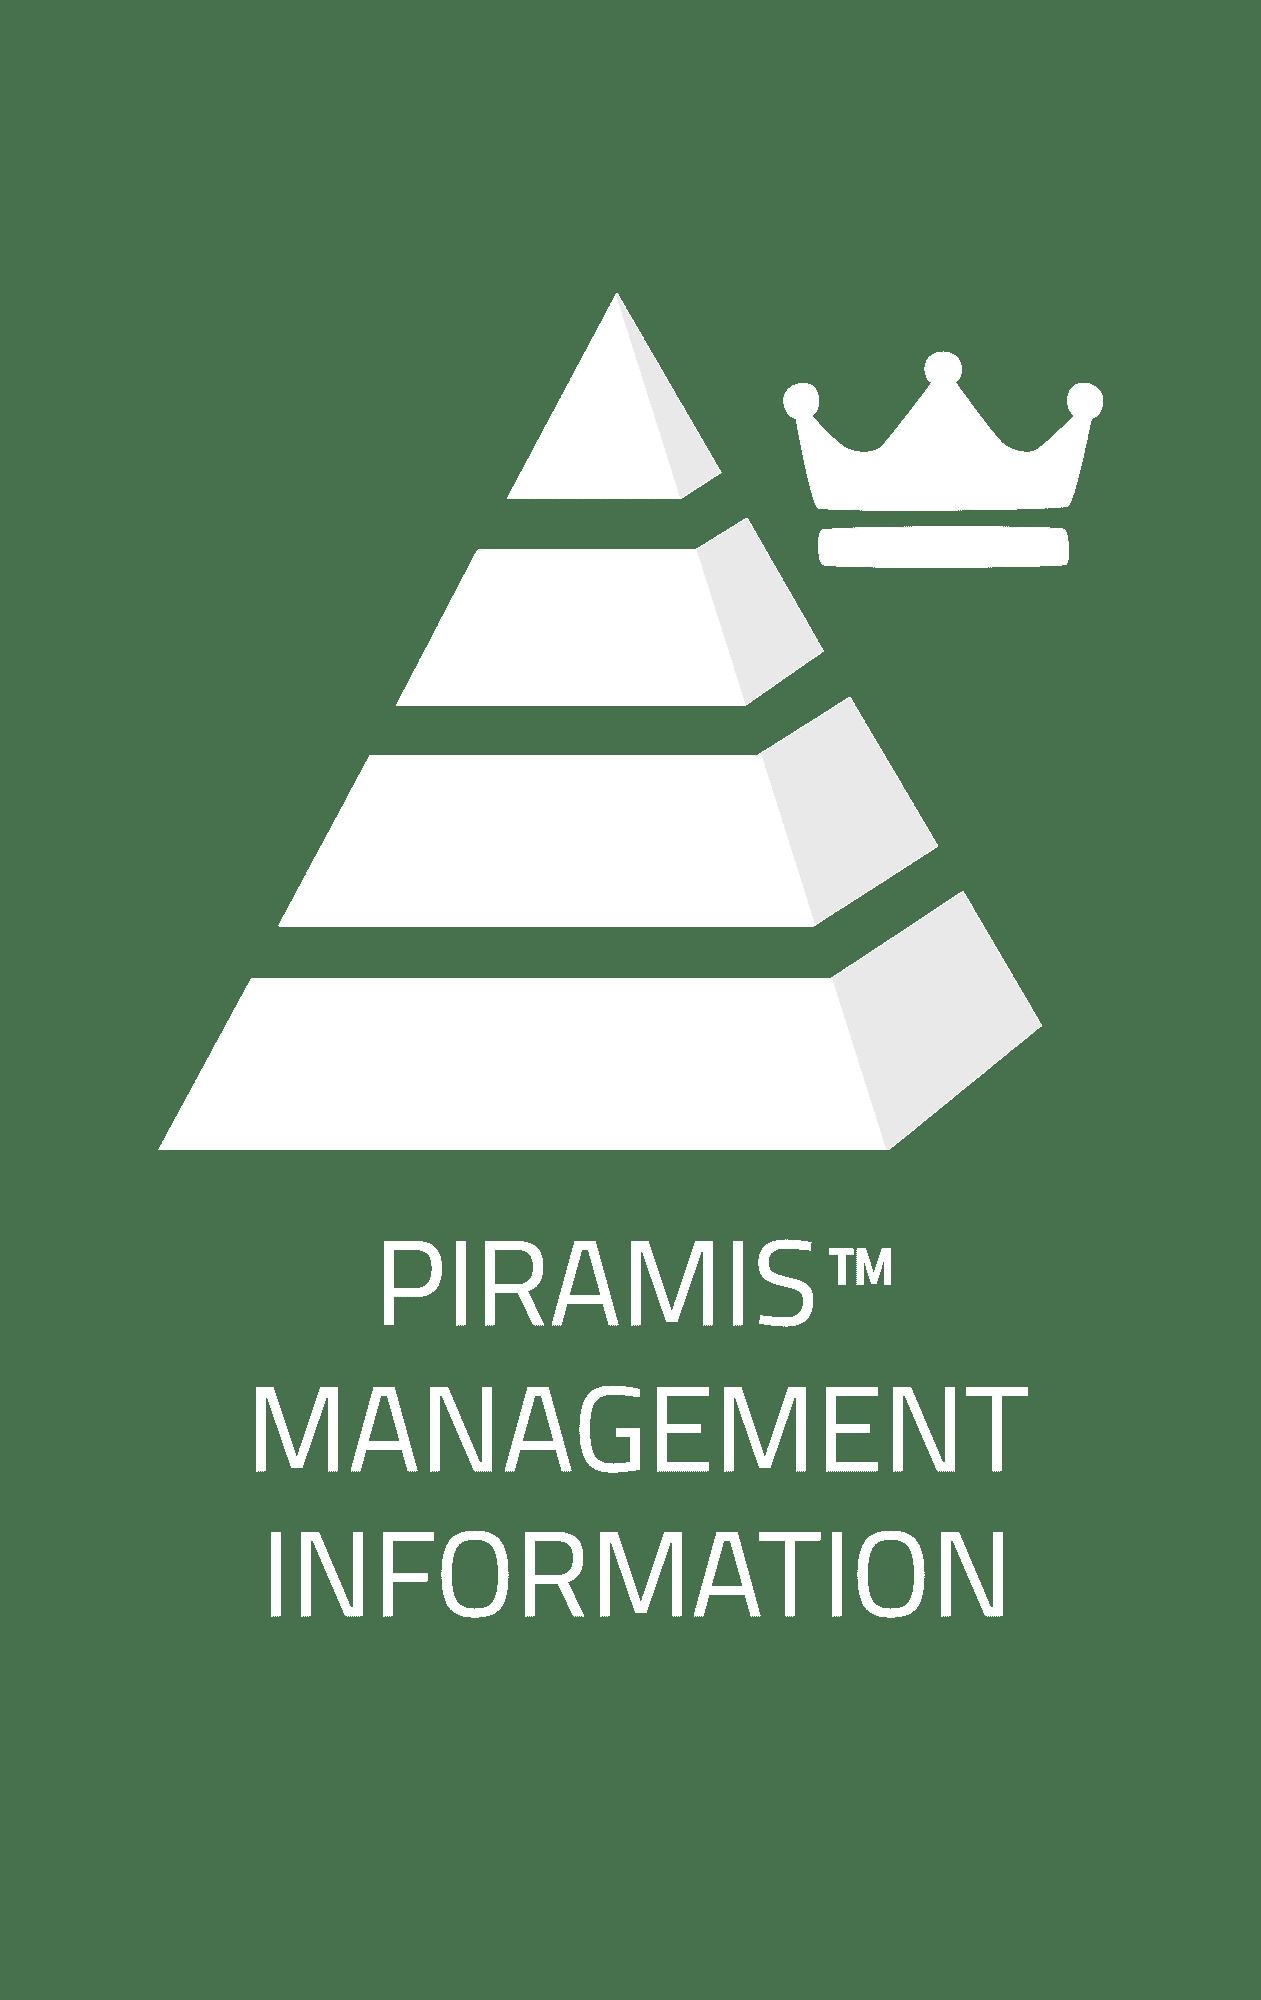 PIRAMIS™ Management Information